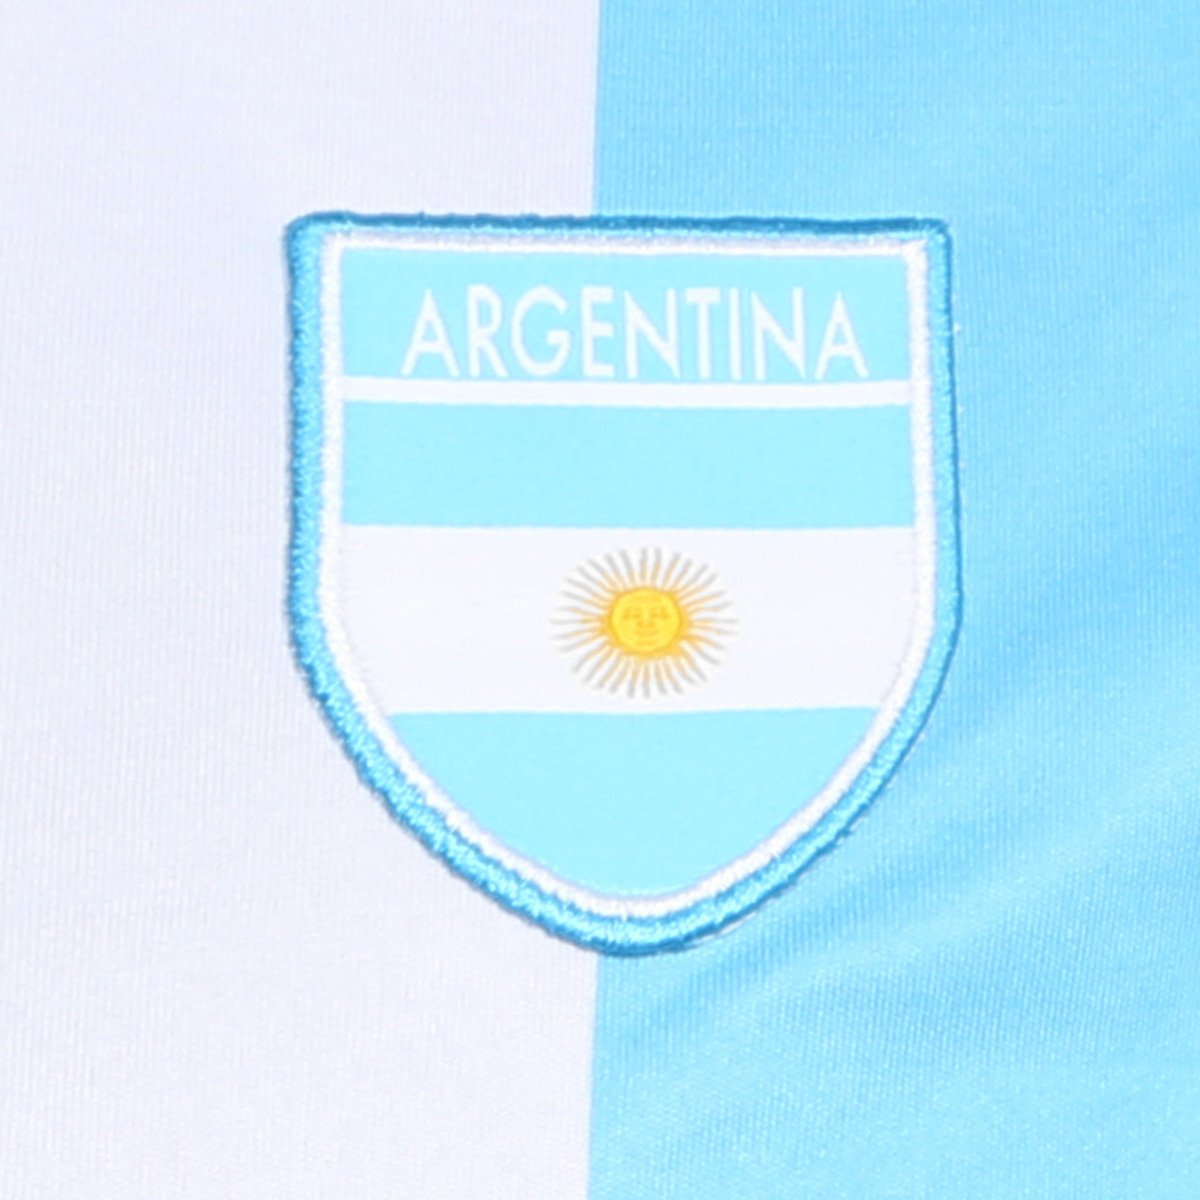 c98d408145 Camisa Argentina 1990 n° 10 Lotto Masculina - Branco e Azul - Compre ...